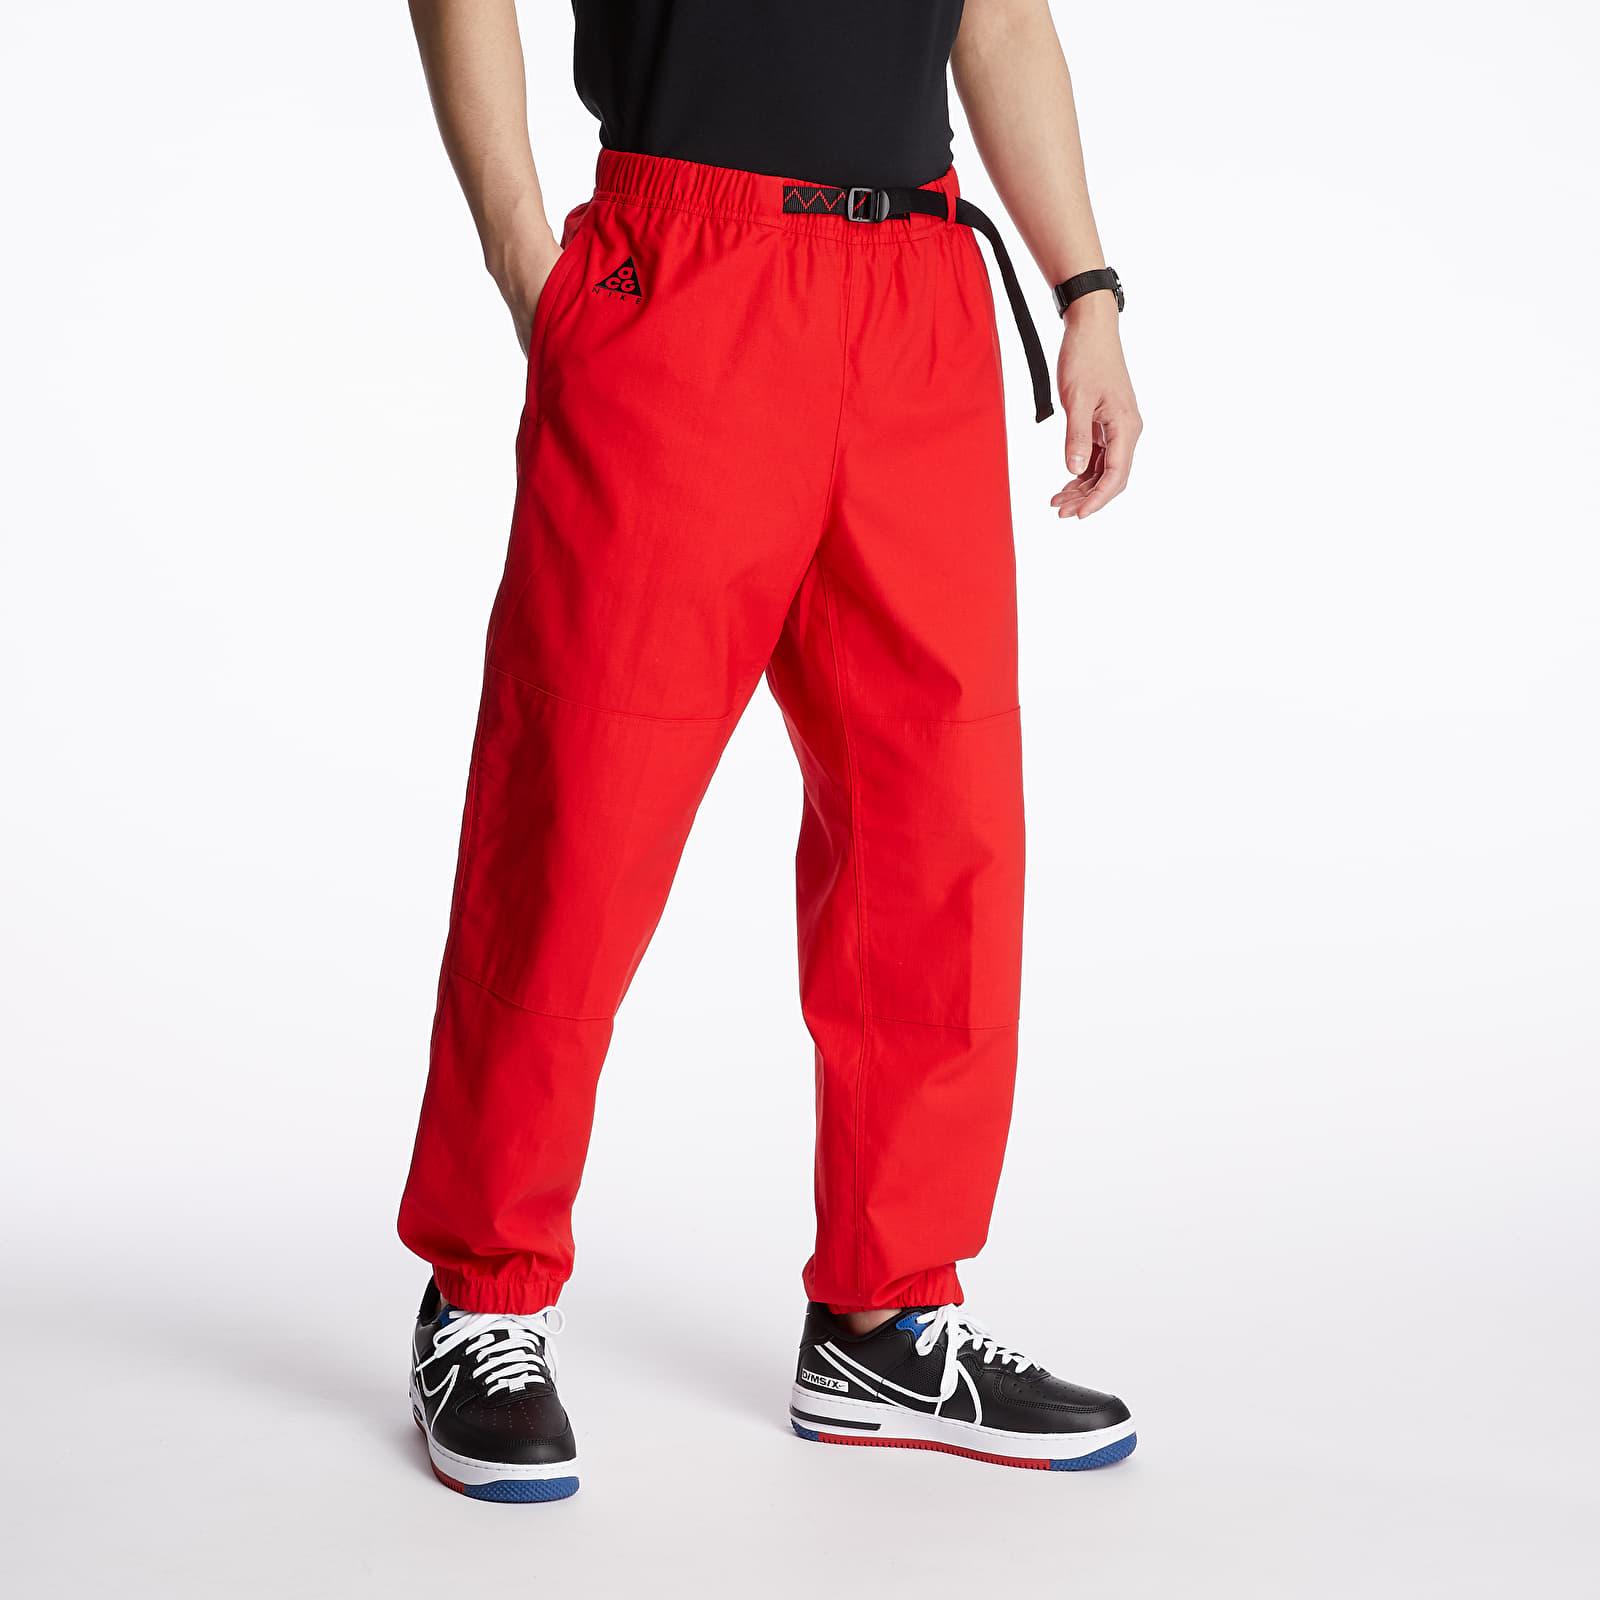 Nike NRG ACG Trail Pants